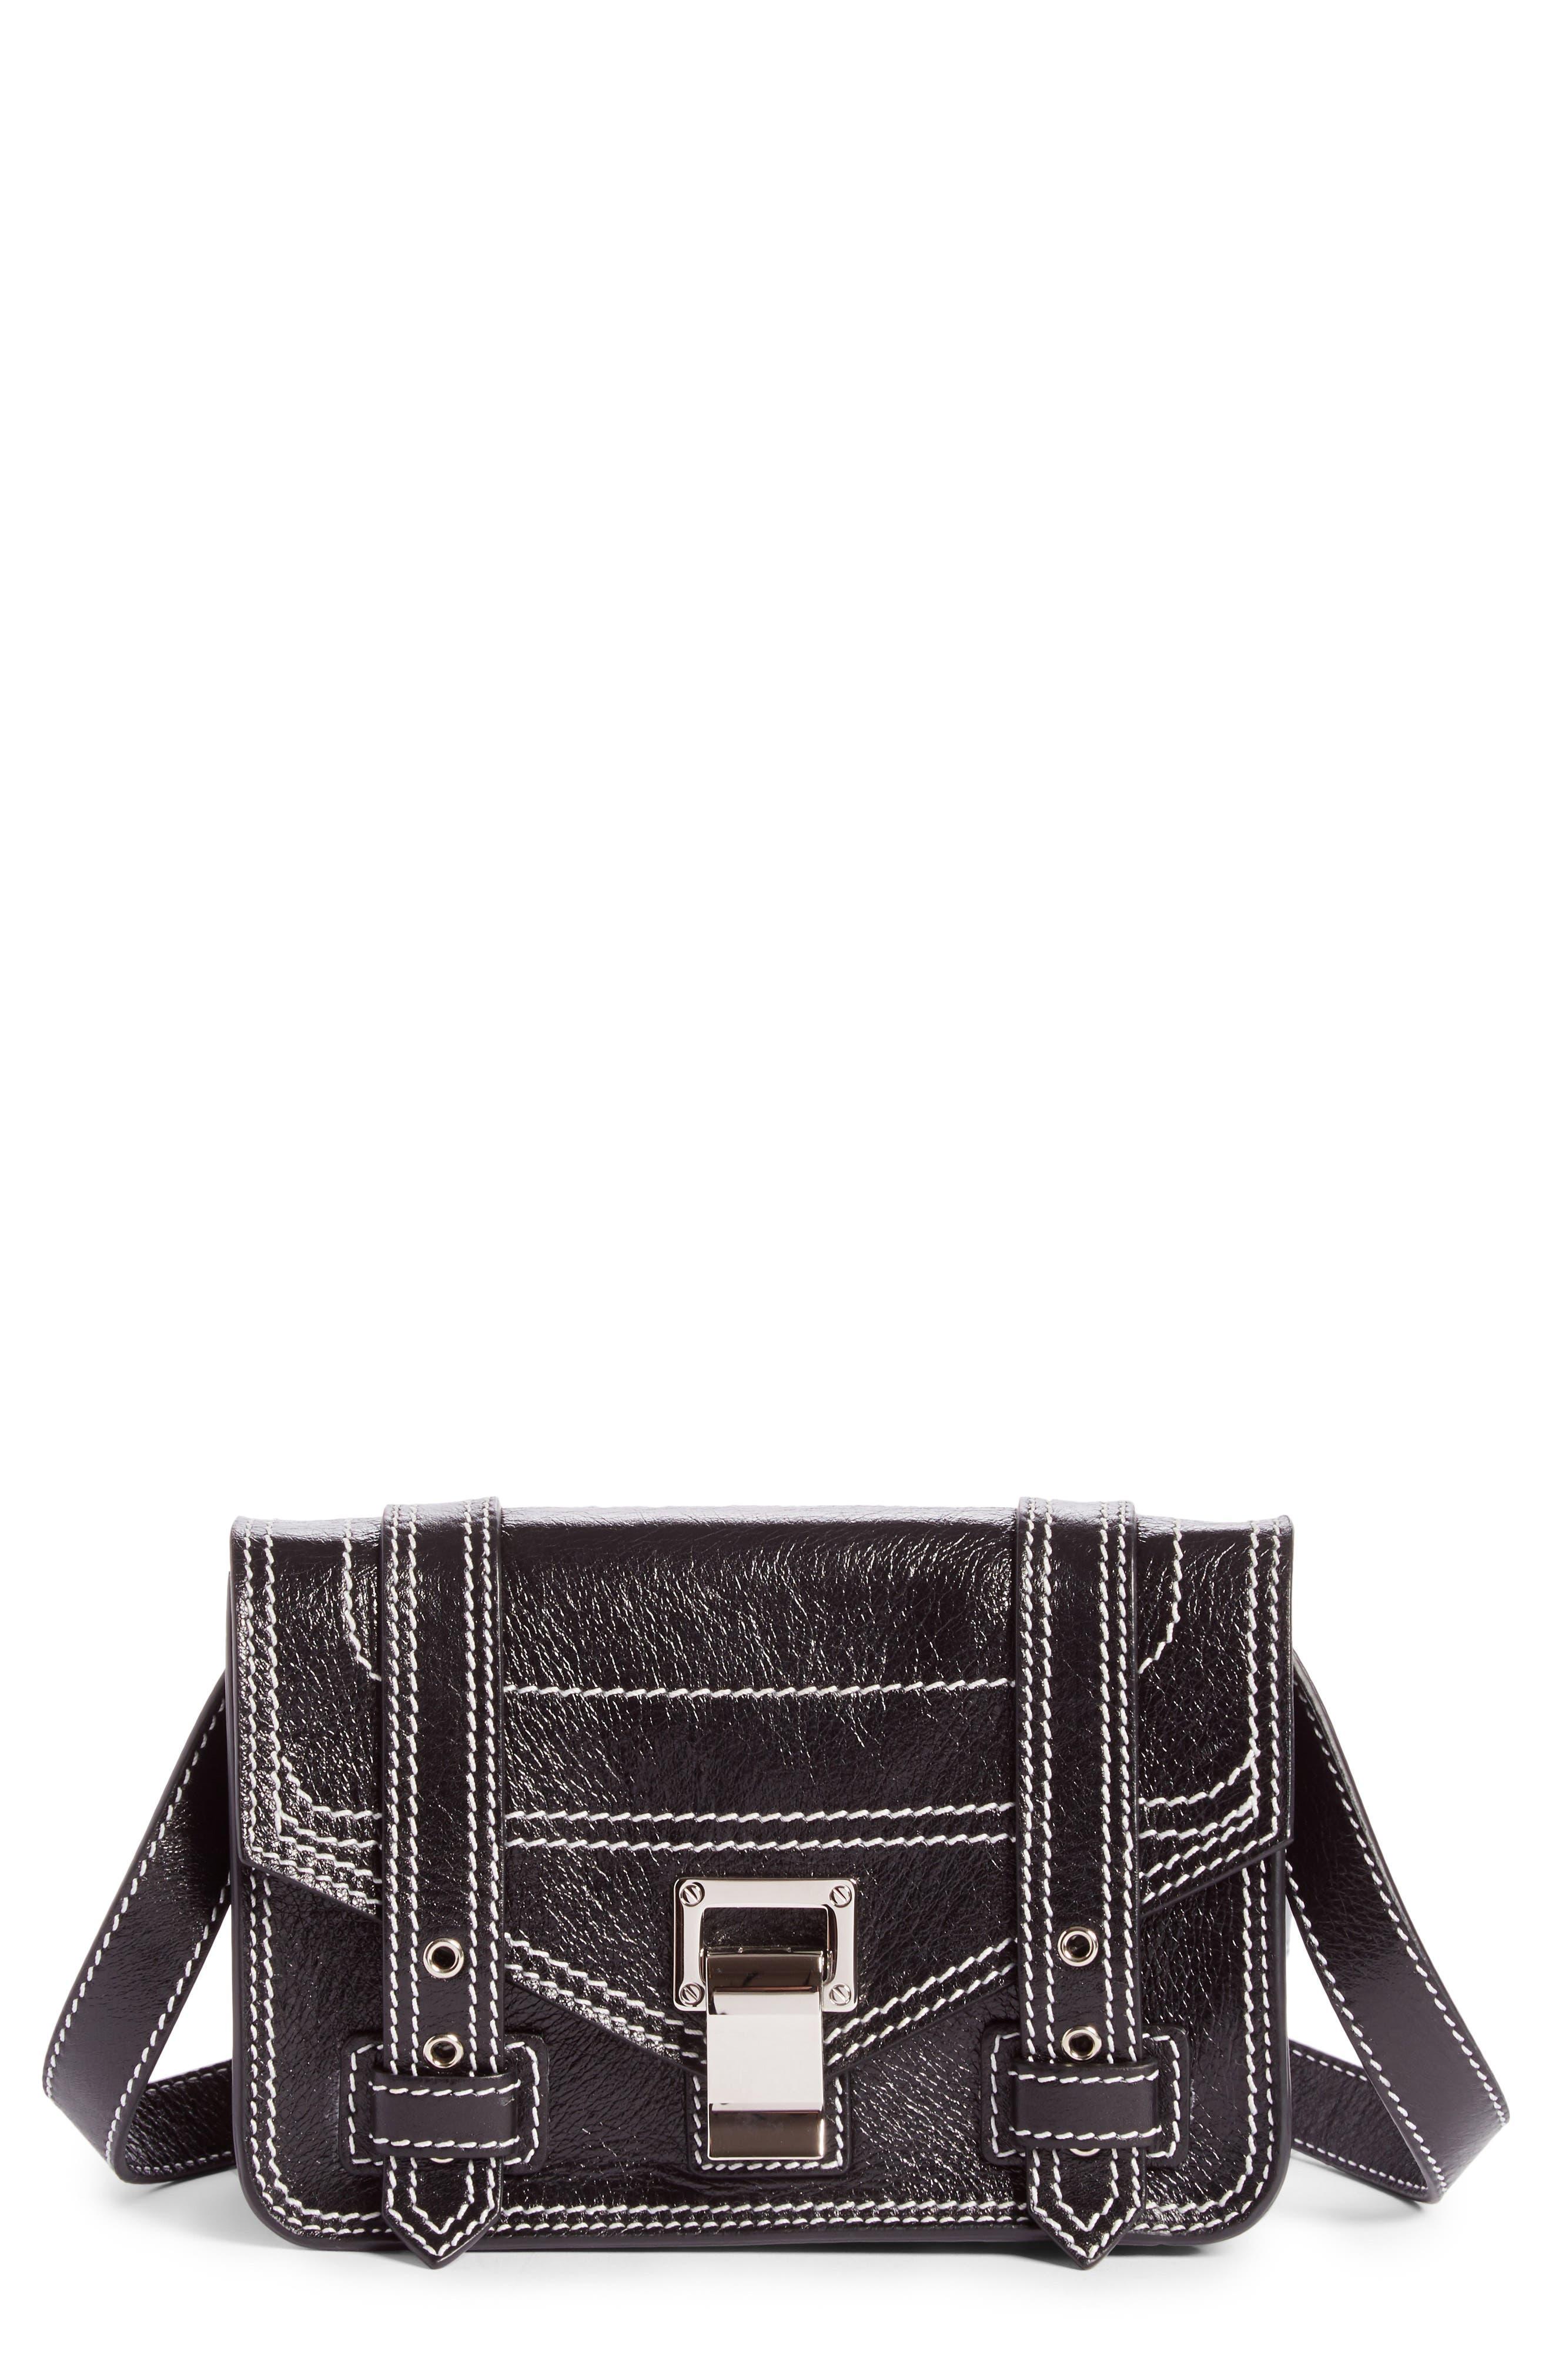 Alternate Image 1 Selected - Proenza Schouler Mini PS1 Leather Crossbody Bag